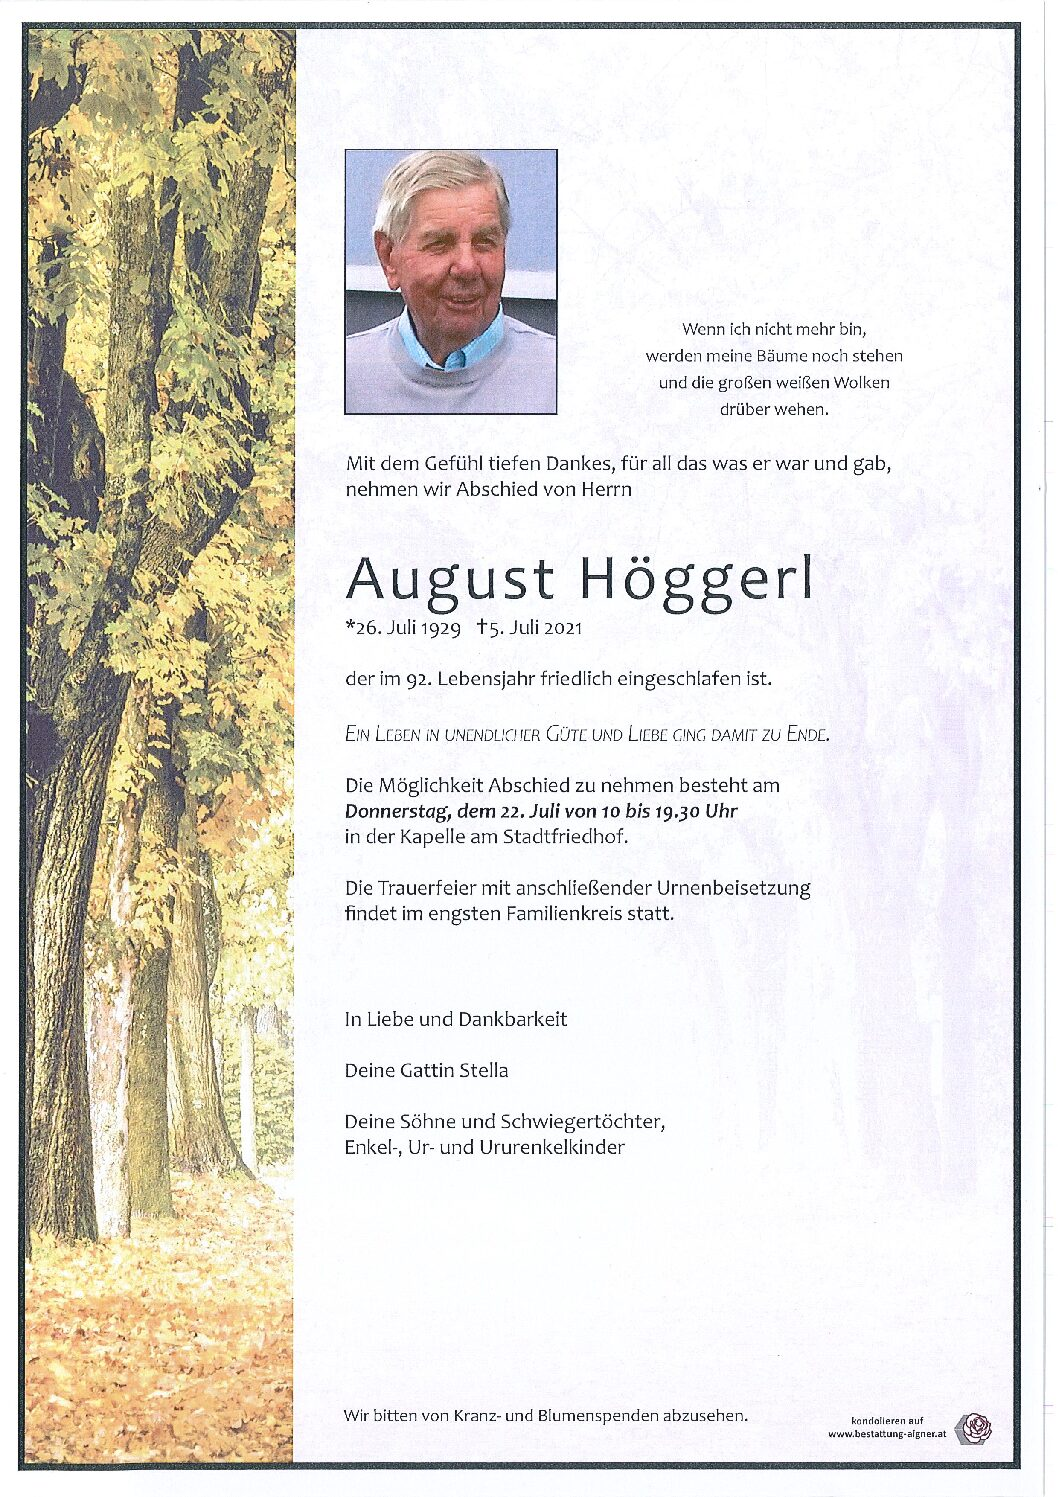 August Höggerl